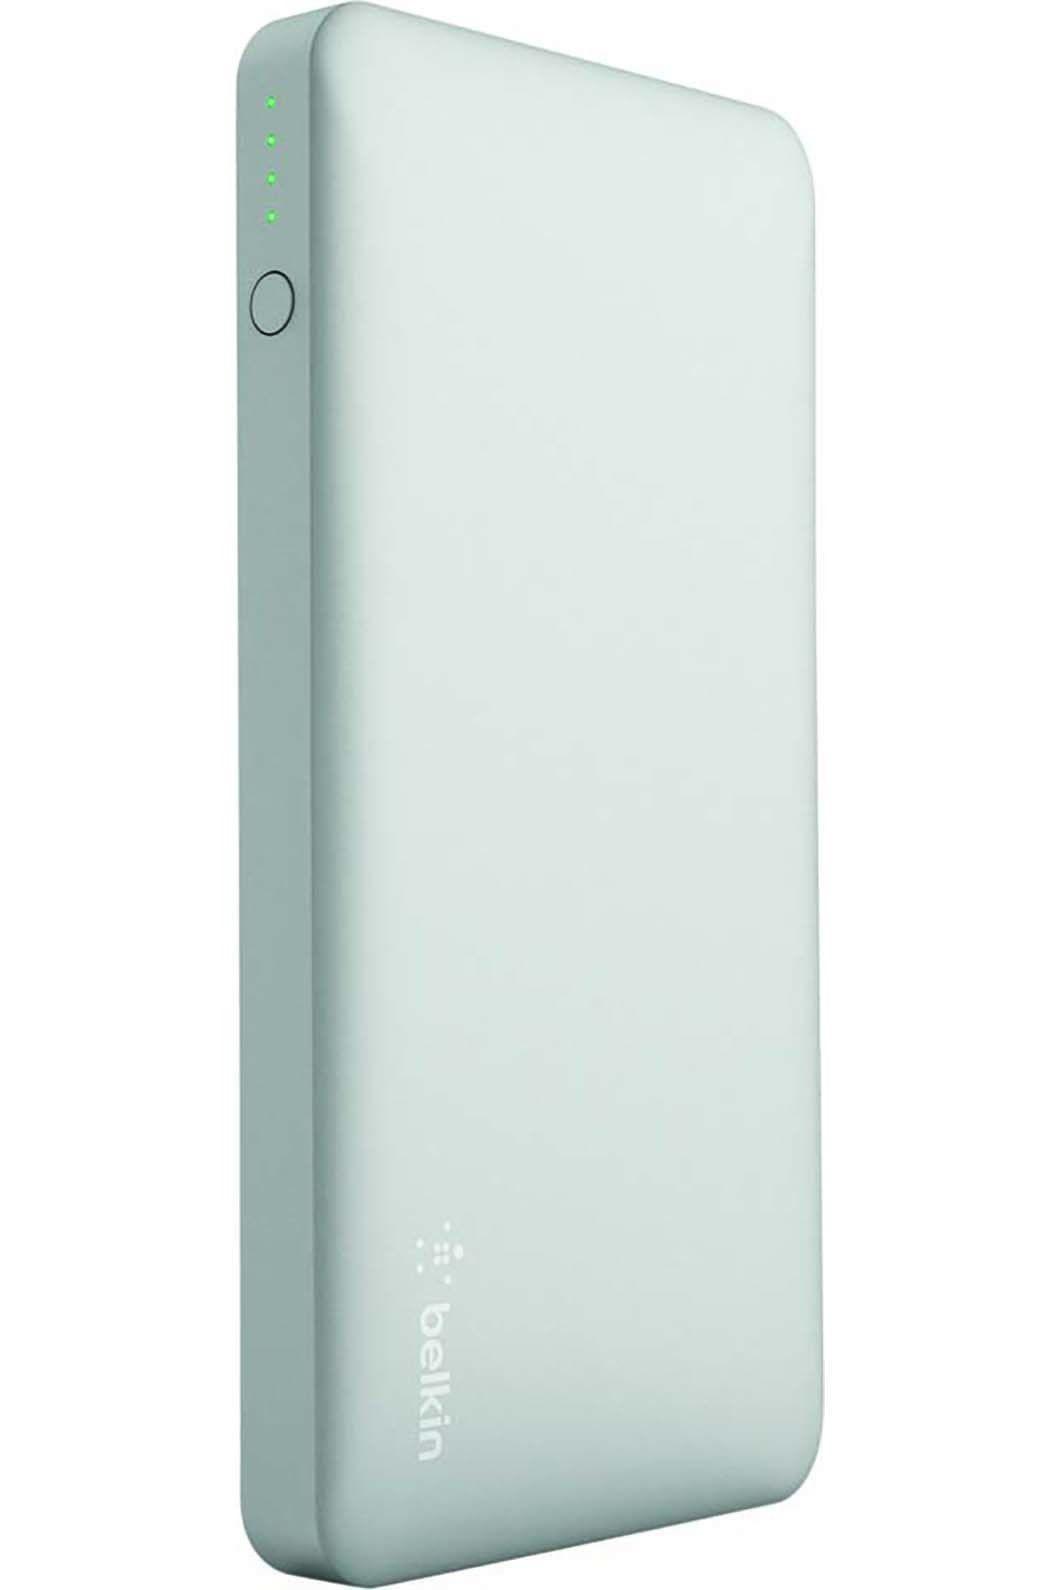 Belkin Pocket Power 10K Power Bank, Silver, hi-res